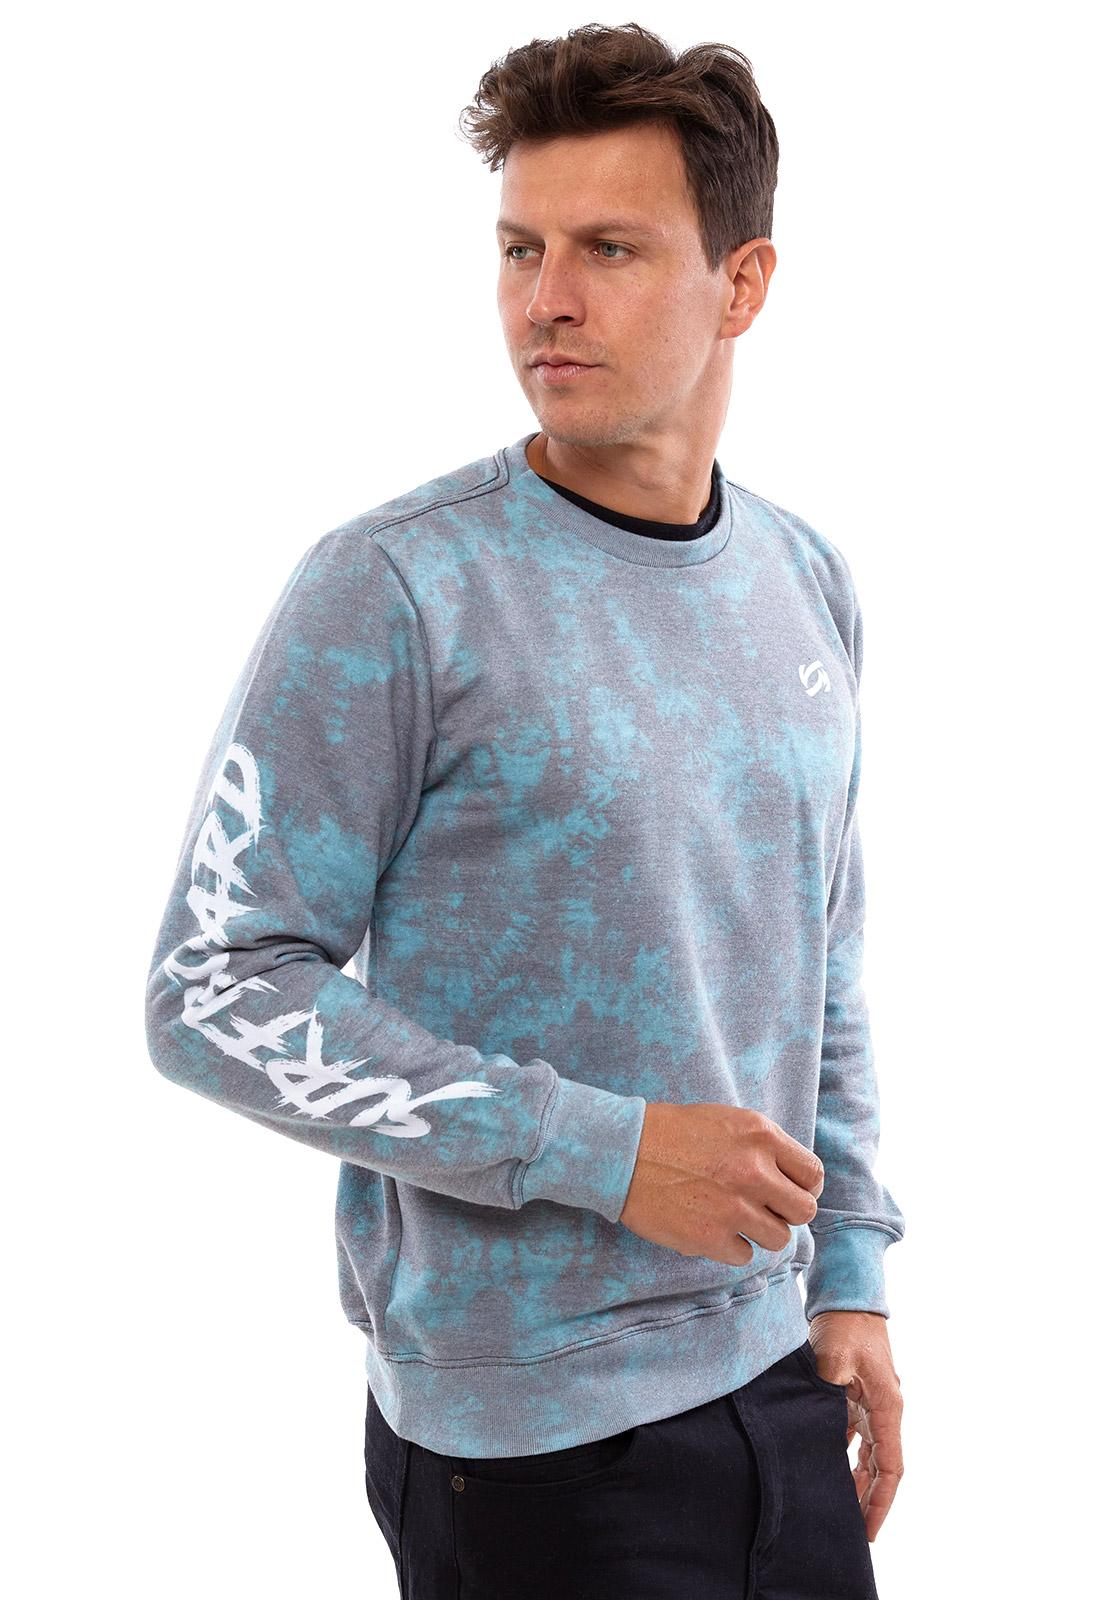 Blusa de Moletom Vida Marinha Gola Redonda Tie Dye Azul/Cinza